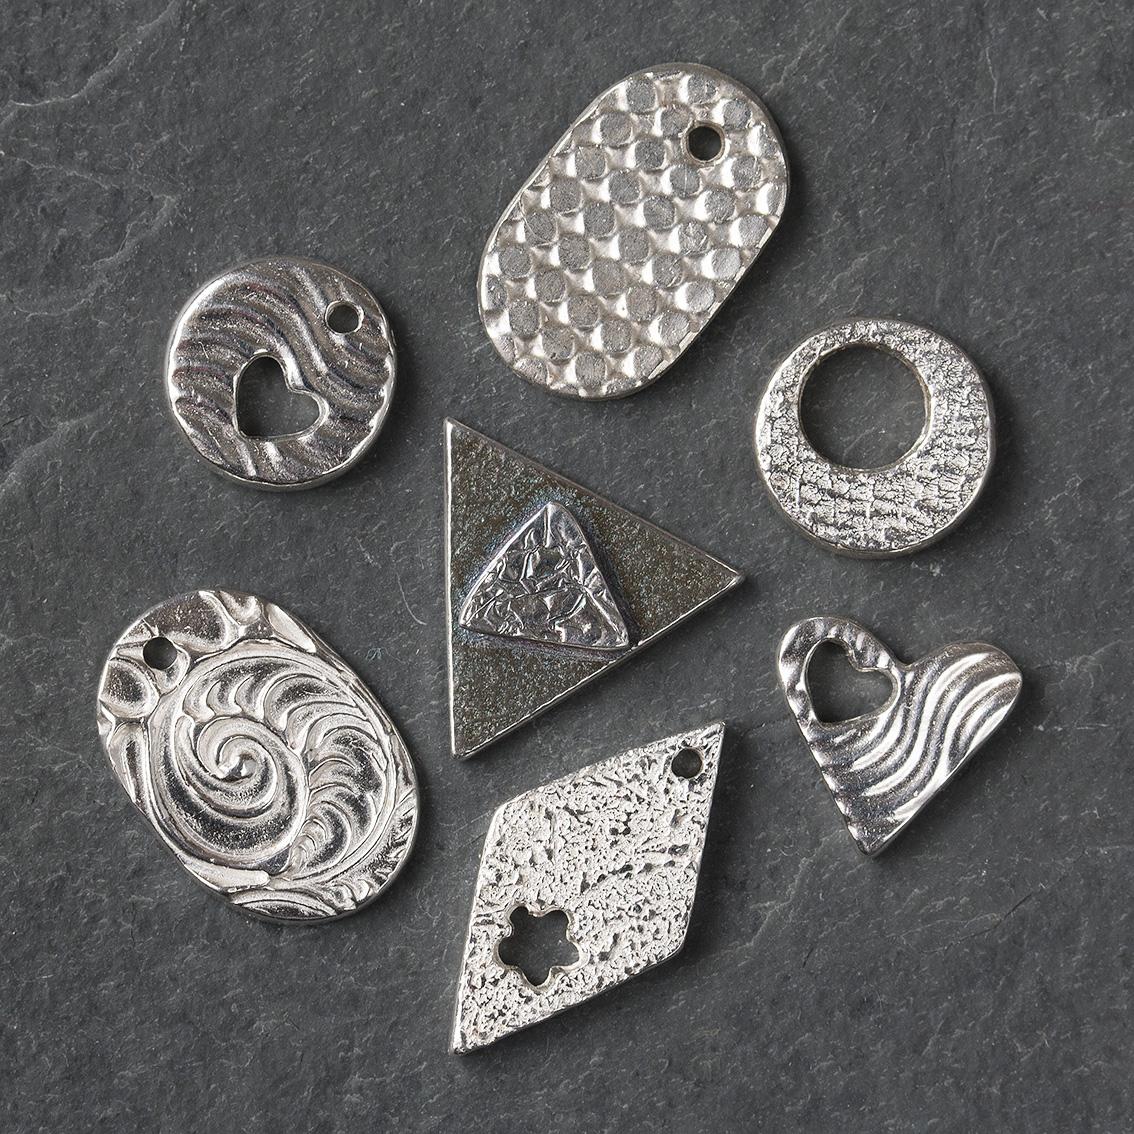 Silver Clay taster & fingerprint classes